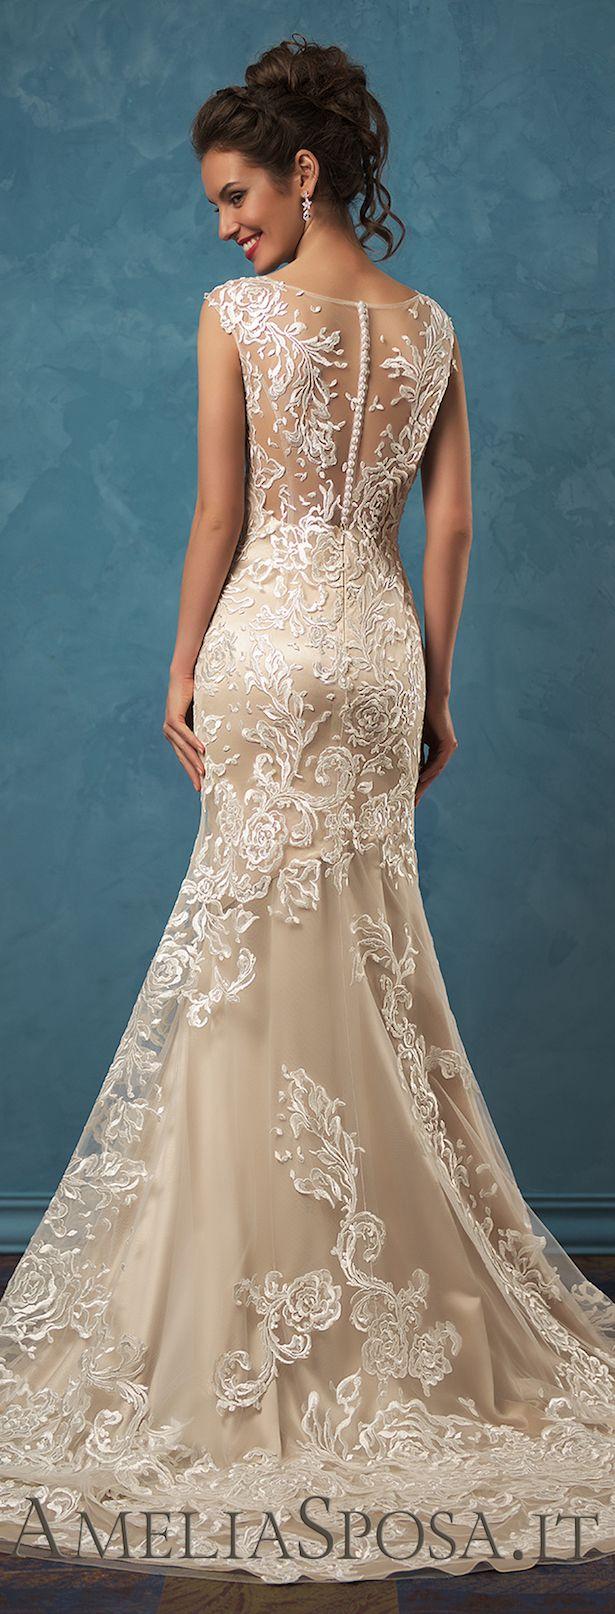 Vestido de noiva chamapgne meia sereia Amelia Sposa 2017 #Wedding #Dress #lace